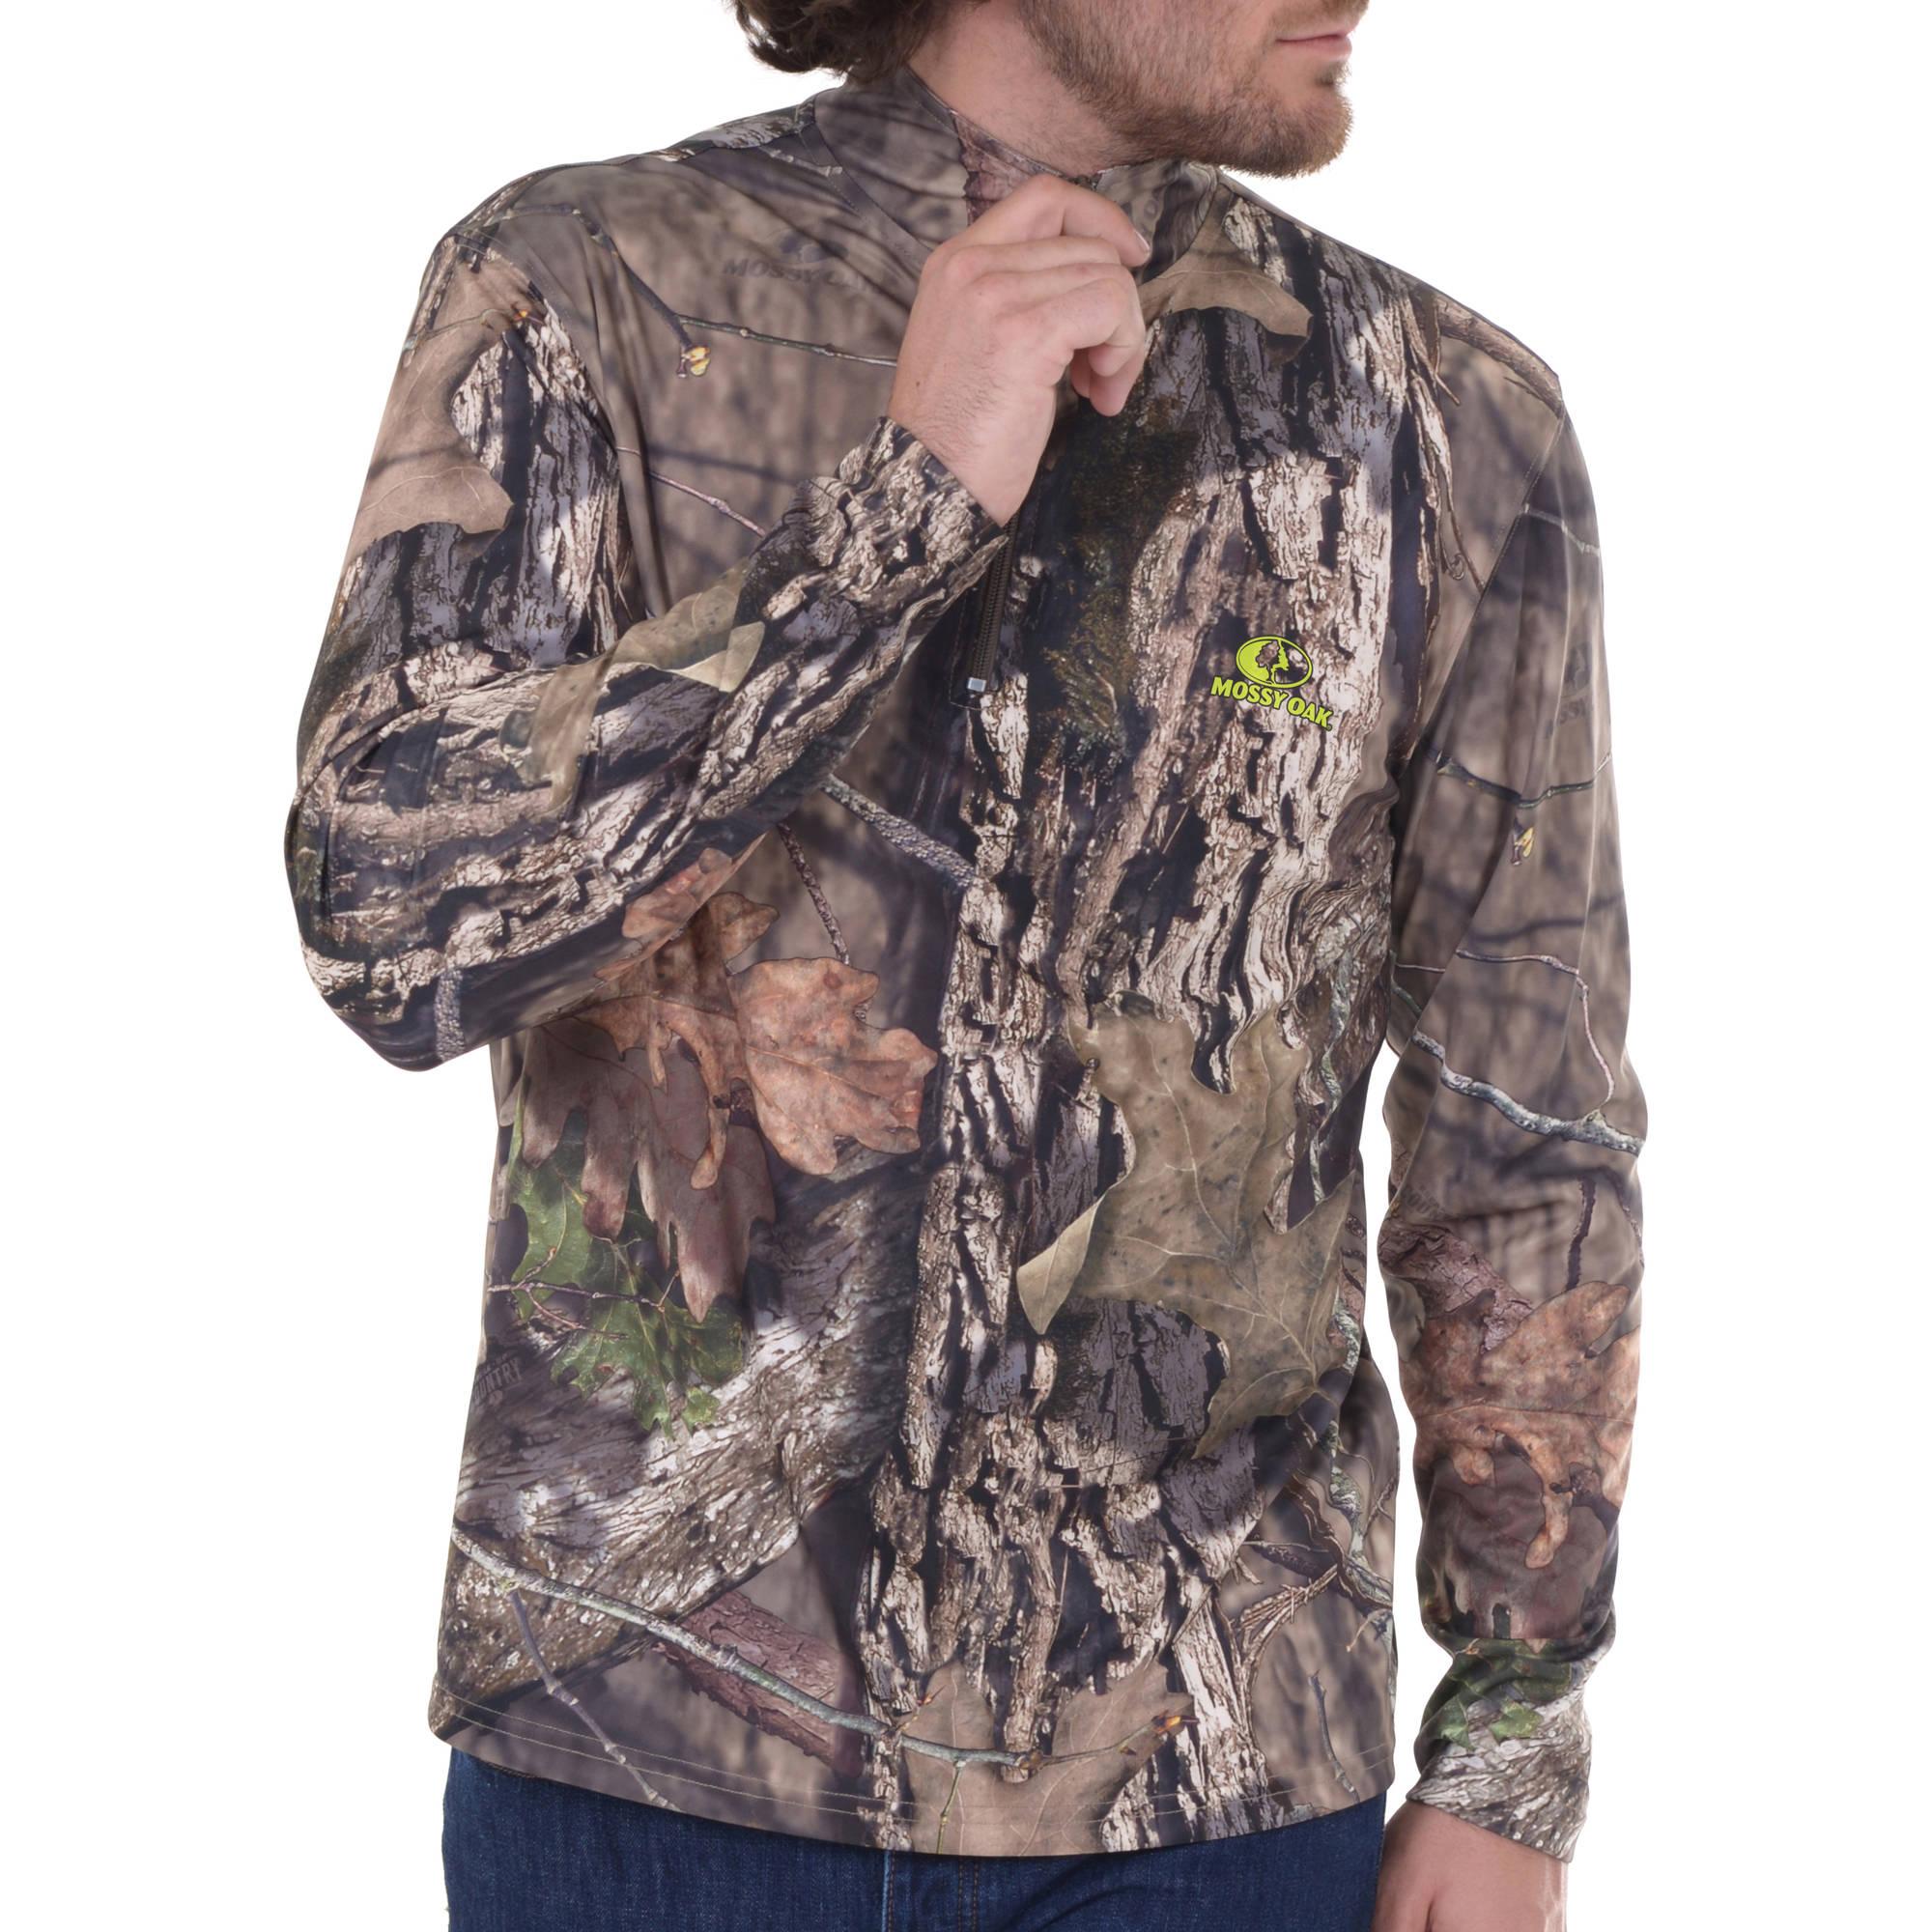 Men's 1/4 Zip Long Sleeve Camo Performance Top - Mossy Oak Country